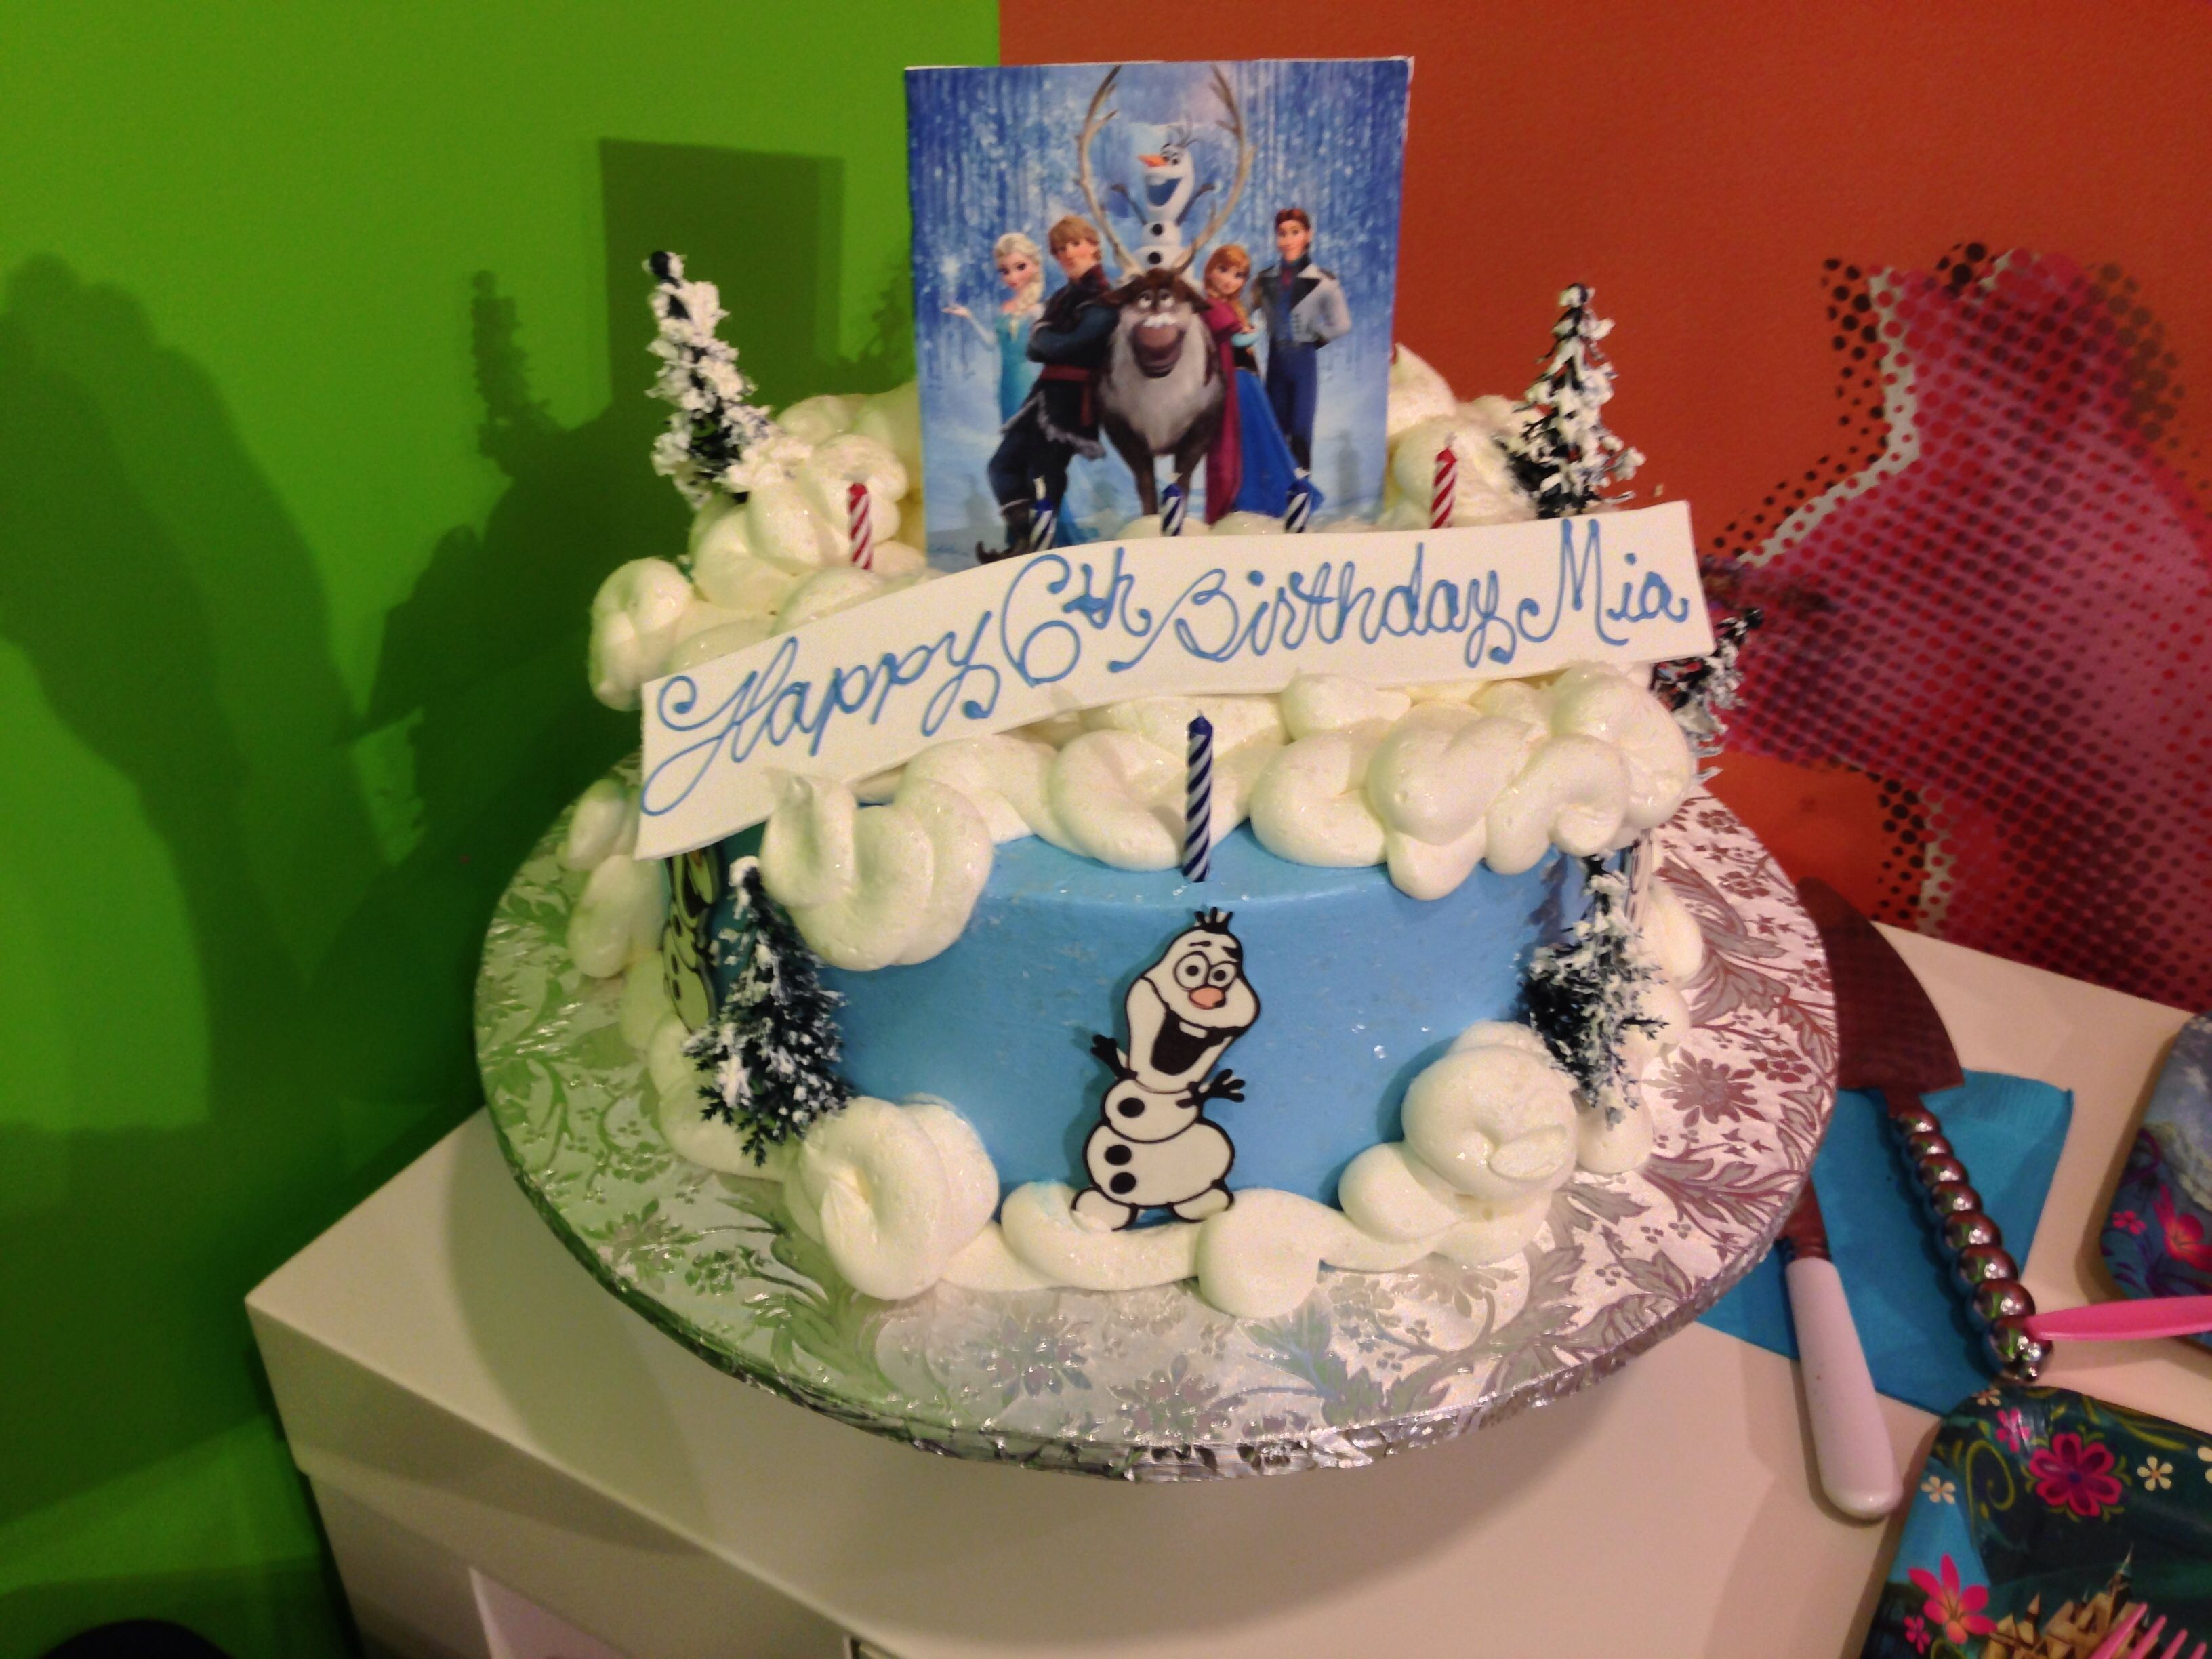 Disneys Frozen Birthday Cake From Konditor Meister In Ma Girls